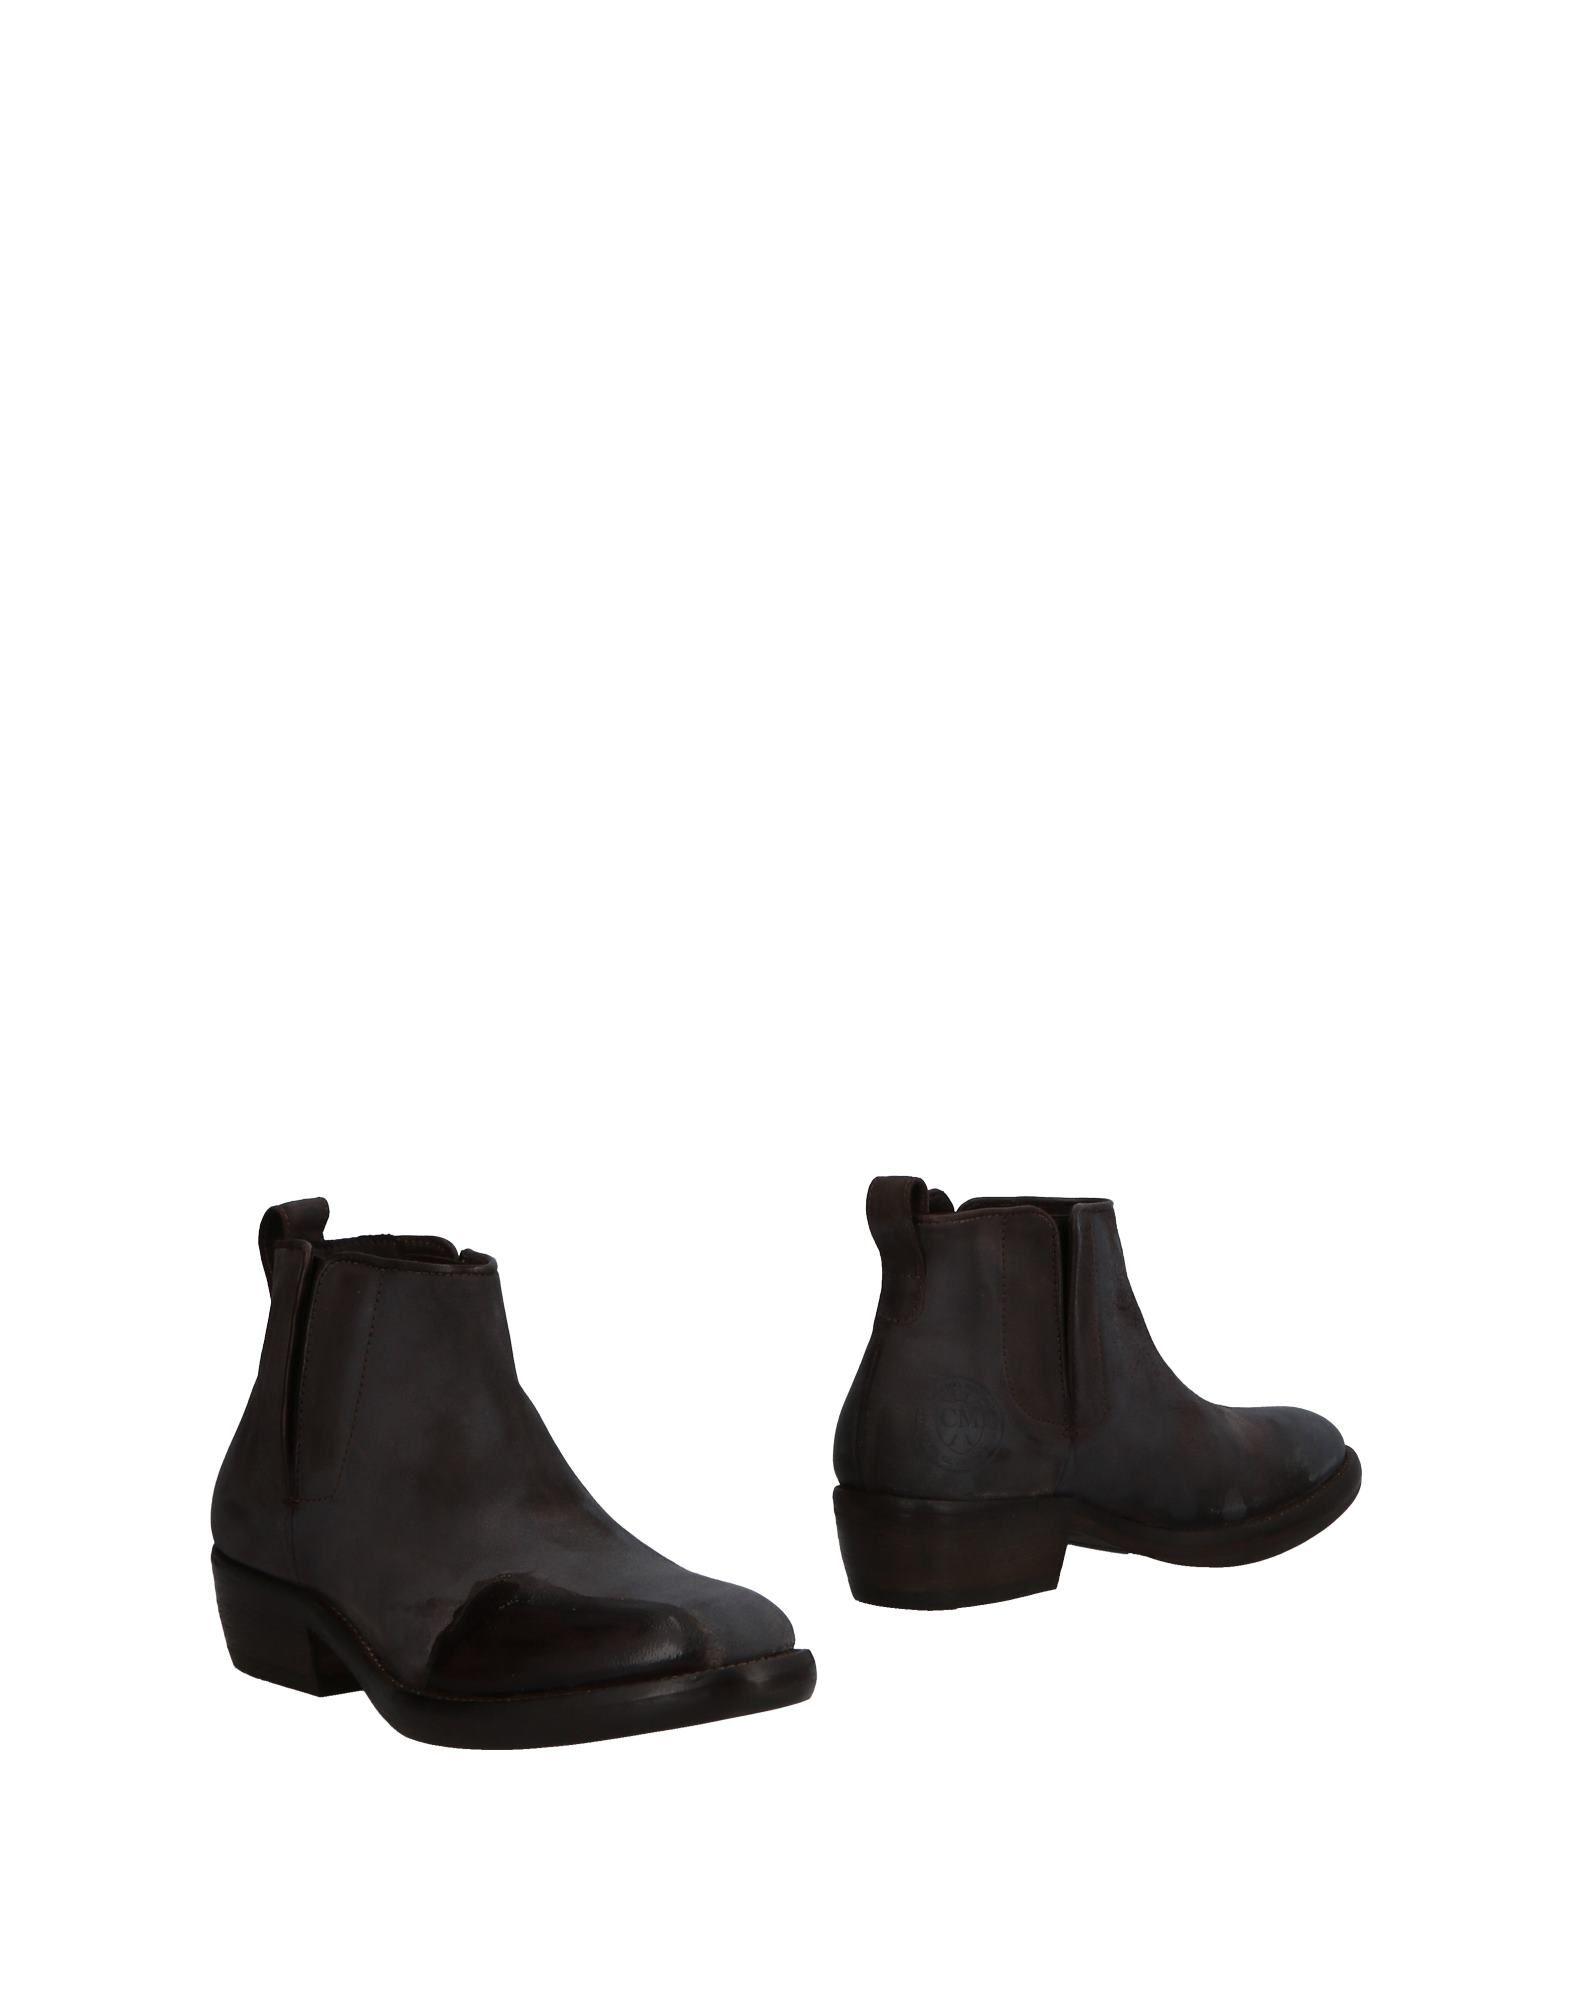 Catarina Women Martins Ankle Boot - Women Catarina Catarina Martins Ankle Boots online on  United Kingdom - 11507013RW a04edc